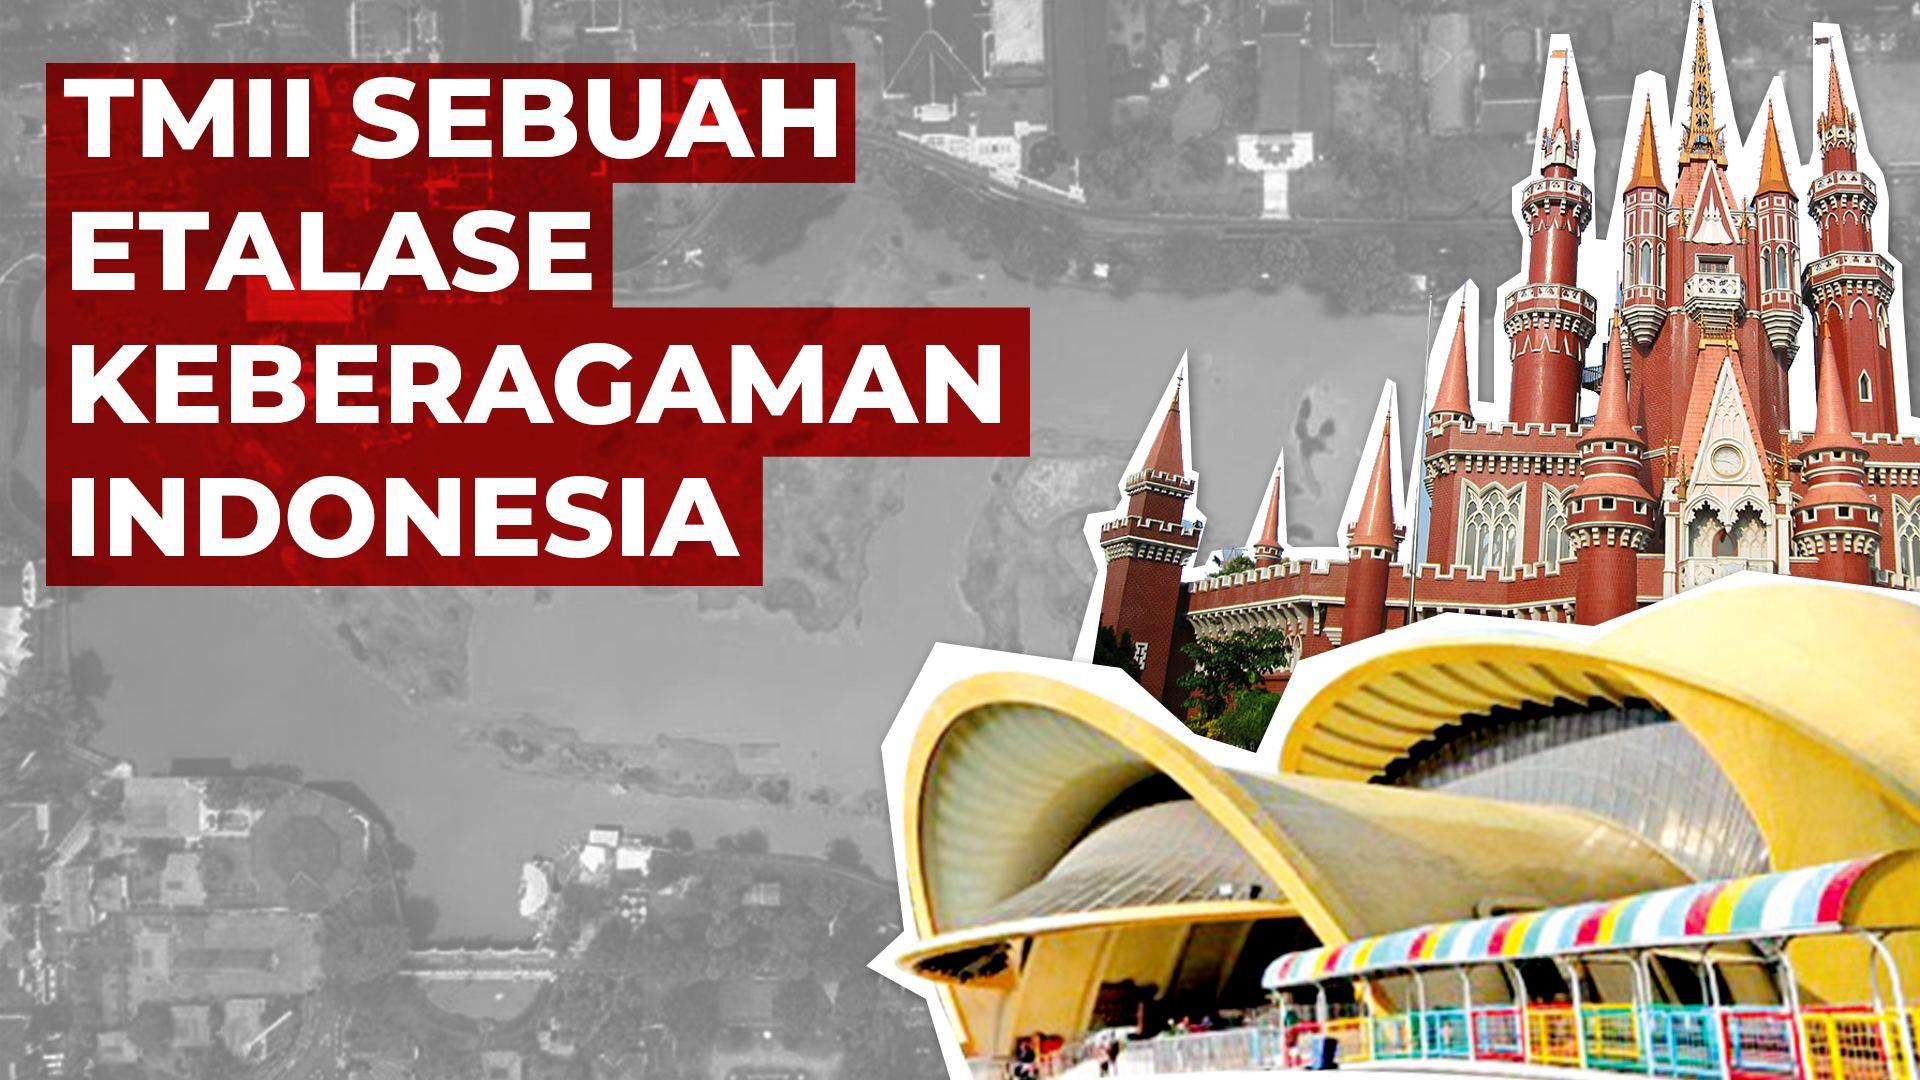 TMII Sebuah Etalase Keberagaman Indonesia